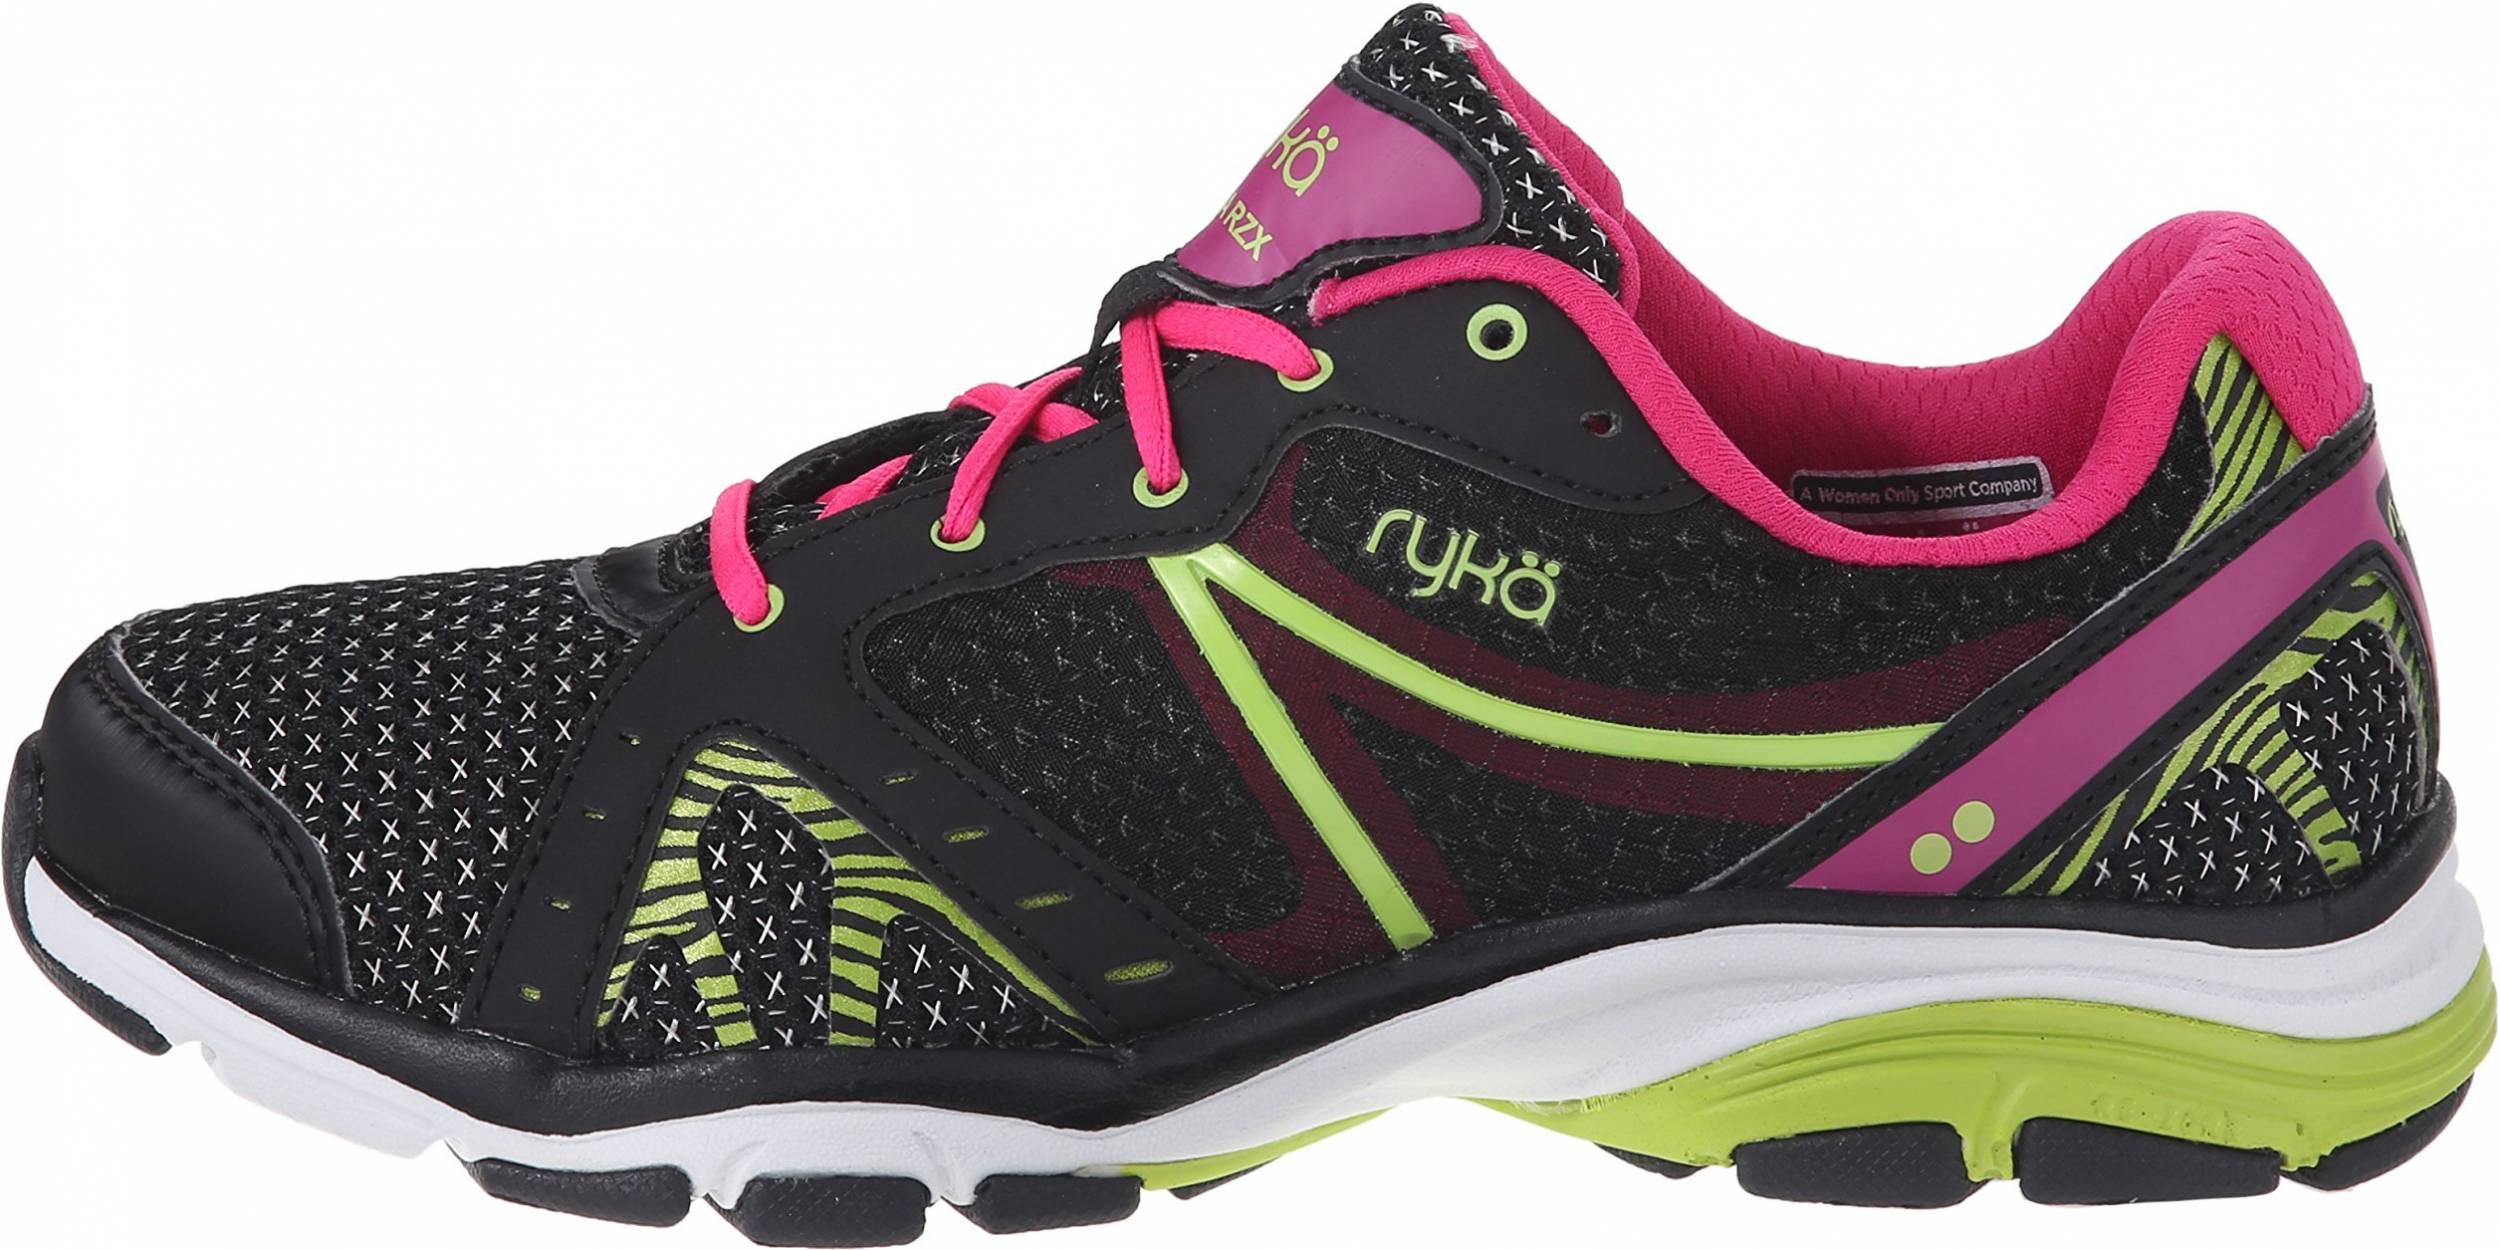 Save 35% on Ryka Training Shoes (17